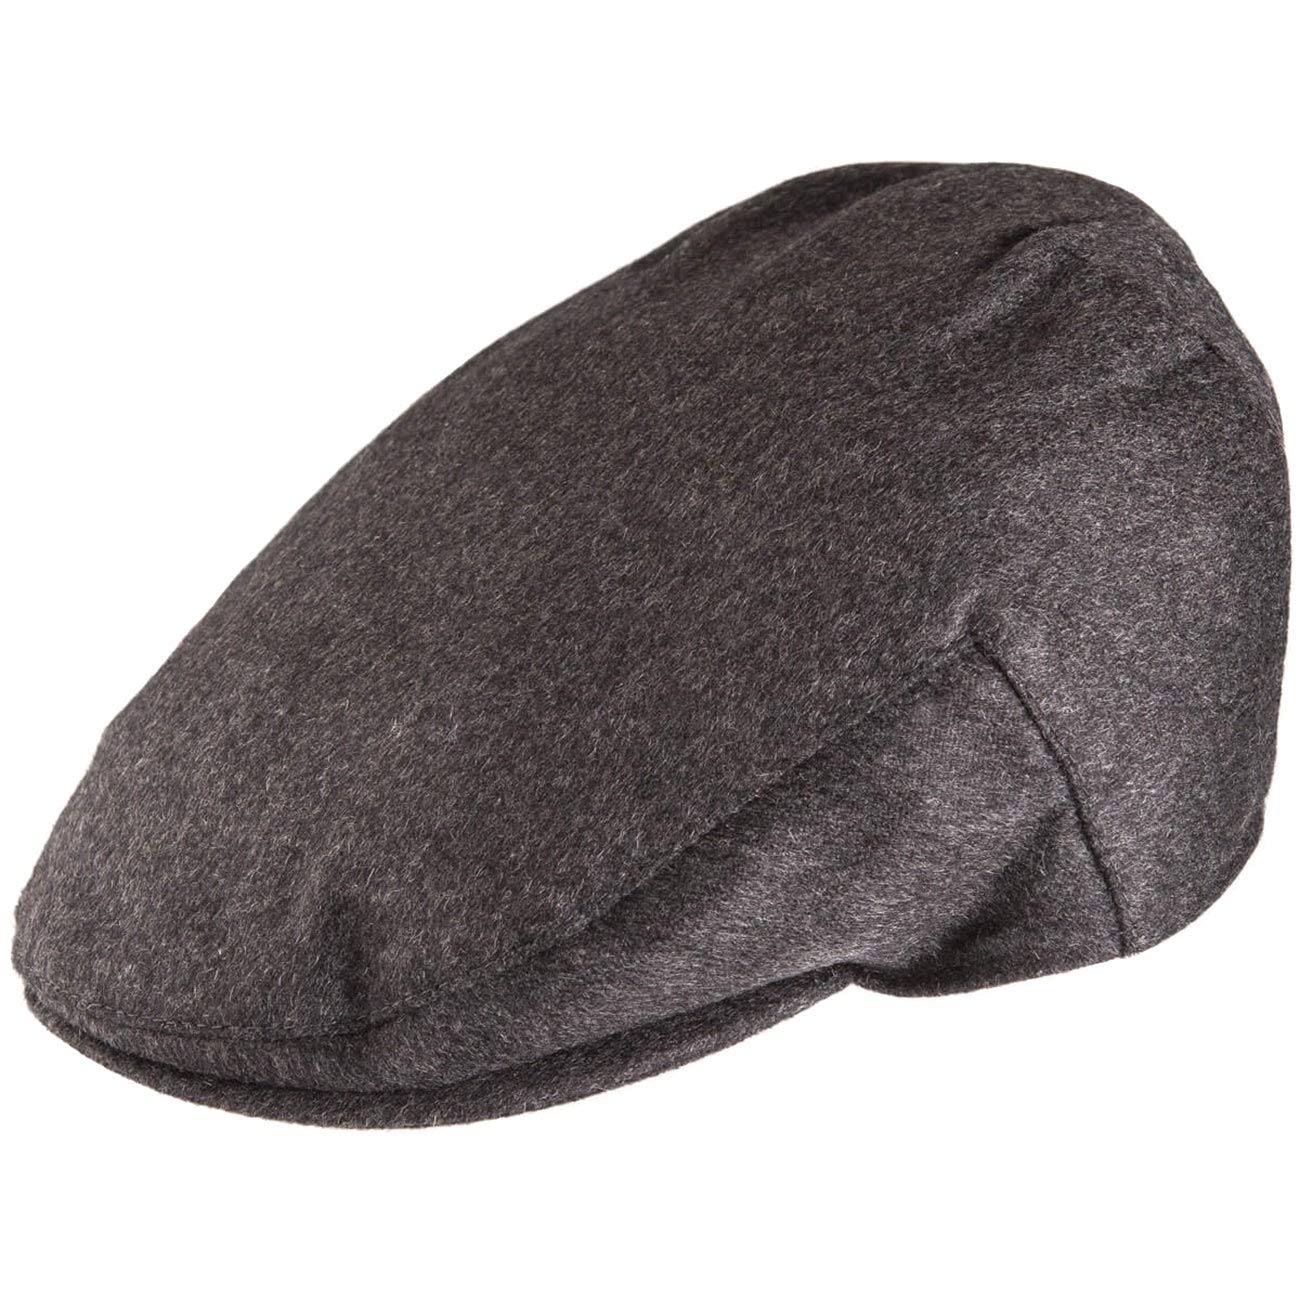 Christys Hats Cashmere Womens Cap